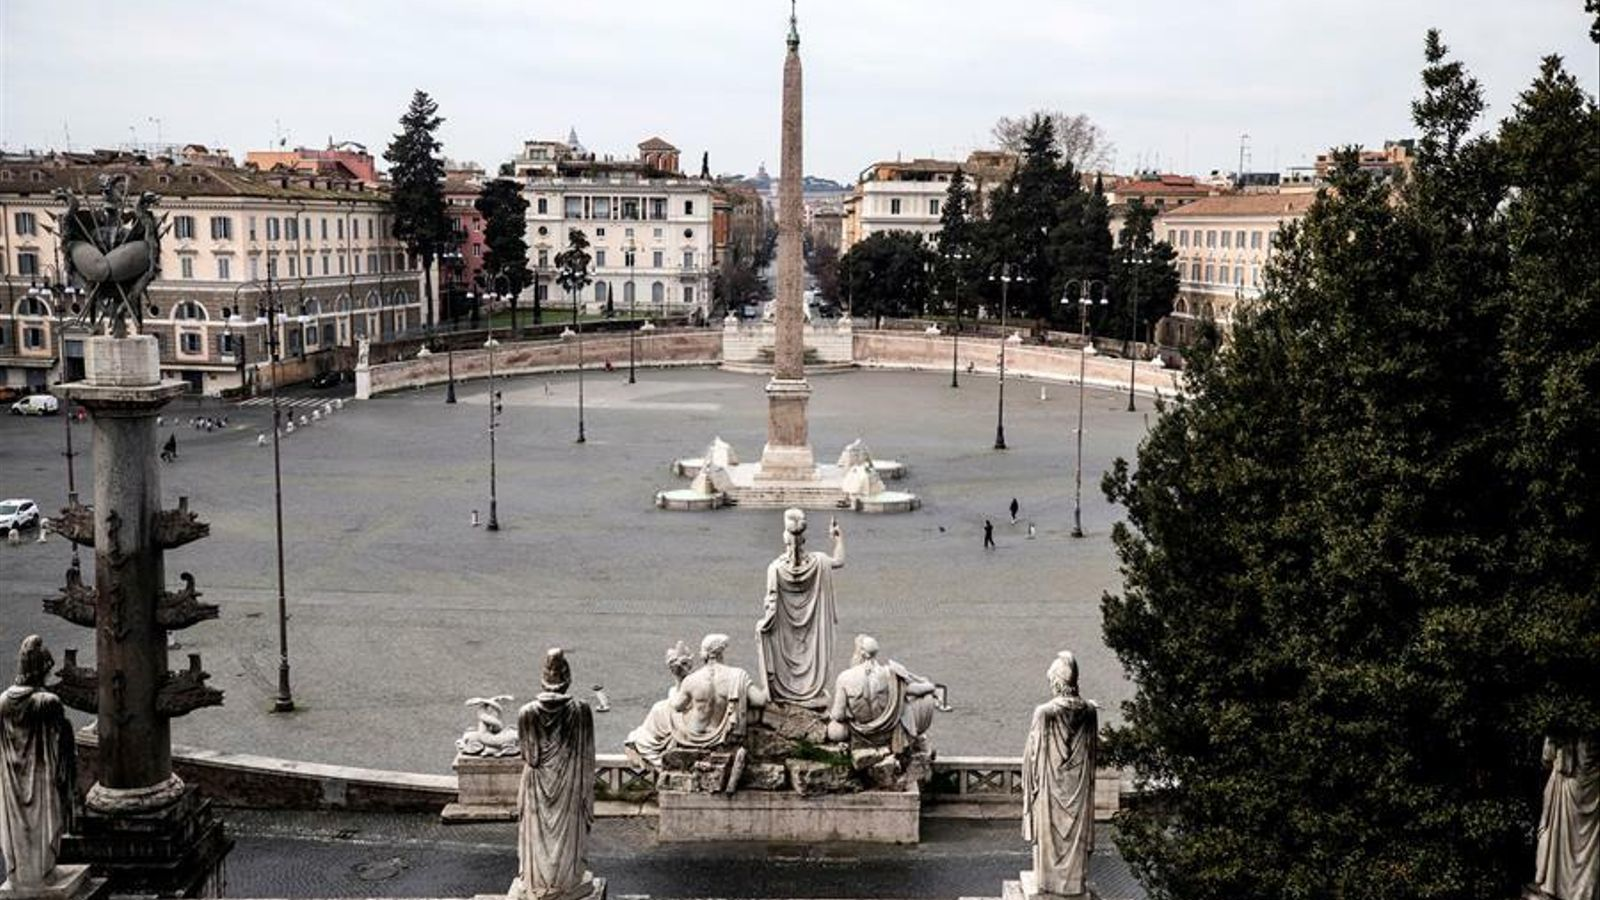 Una imatge de la Plaça del Poble de Roma inusualment buida a causa del confinament obligatori pel coronavirus